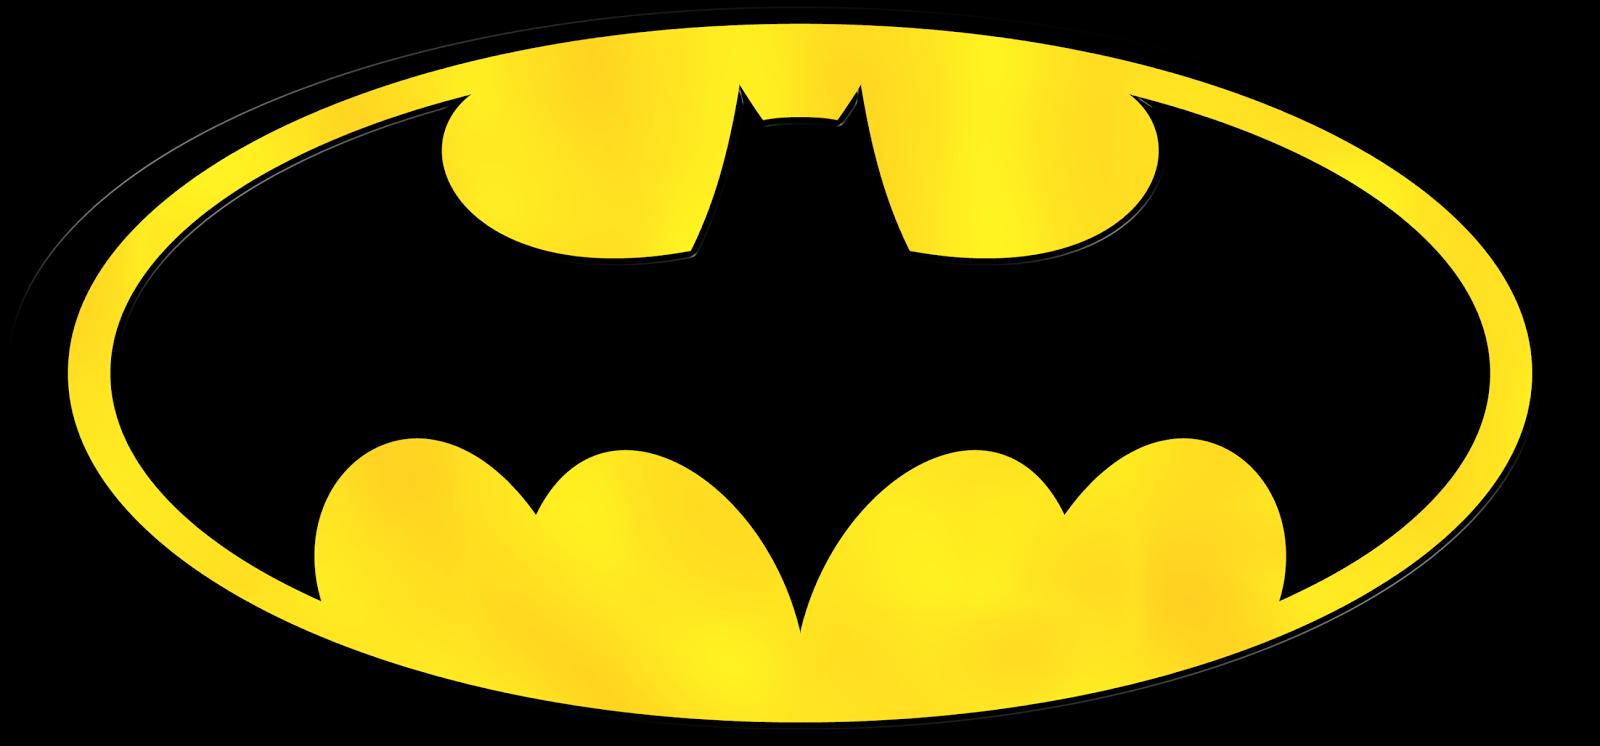 Batman car clipart picture download Batman Clipart at GetDrawings.com | Free for personal use Batman ... picture download